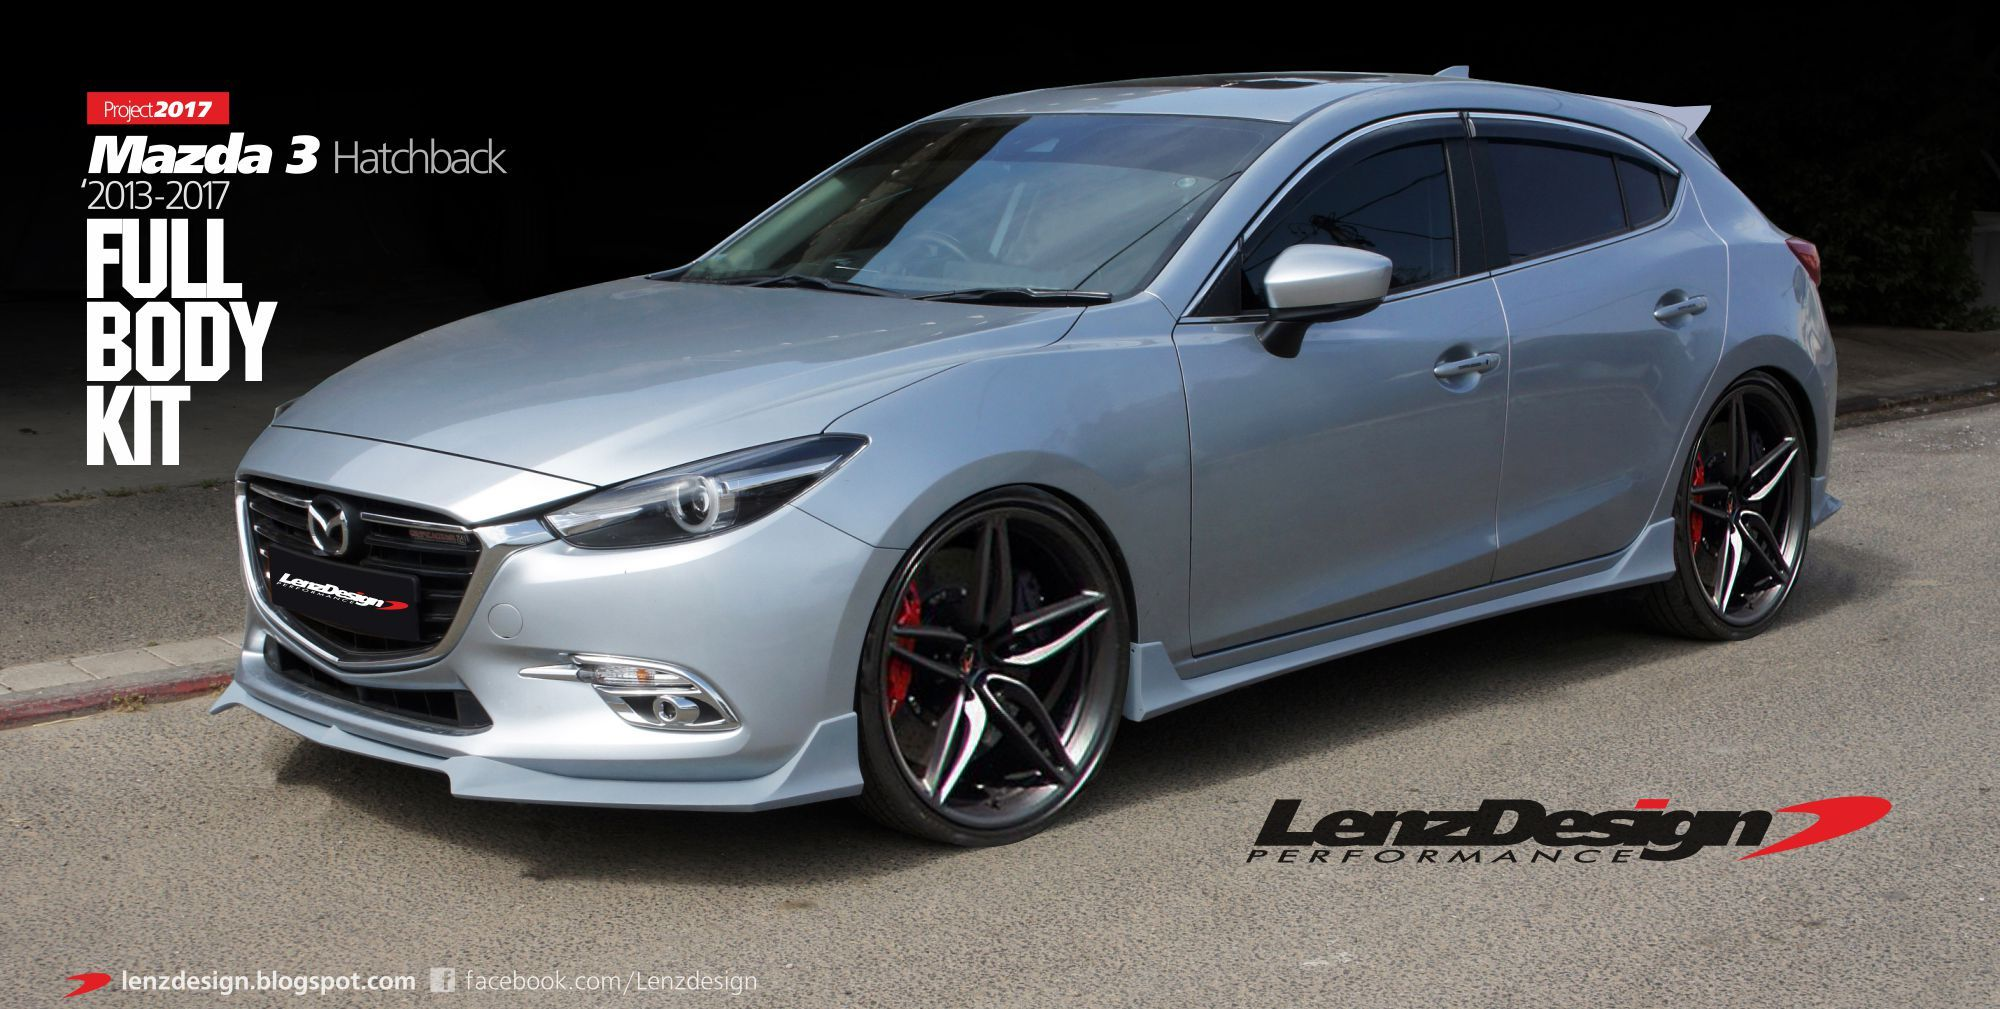 Facebook Com Lenzdesign Http Lenzdesign Blogspot Com Mazda 3 Hatchback Mazda 3 Mazda Cars